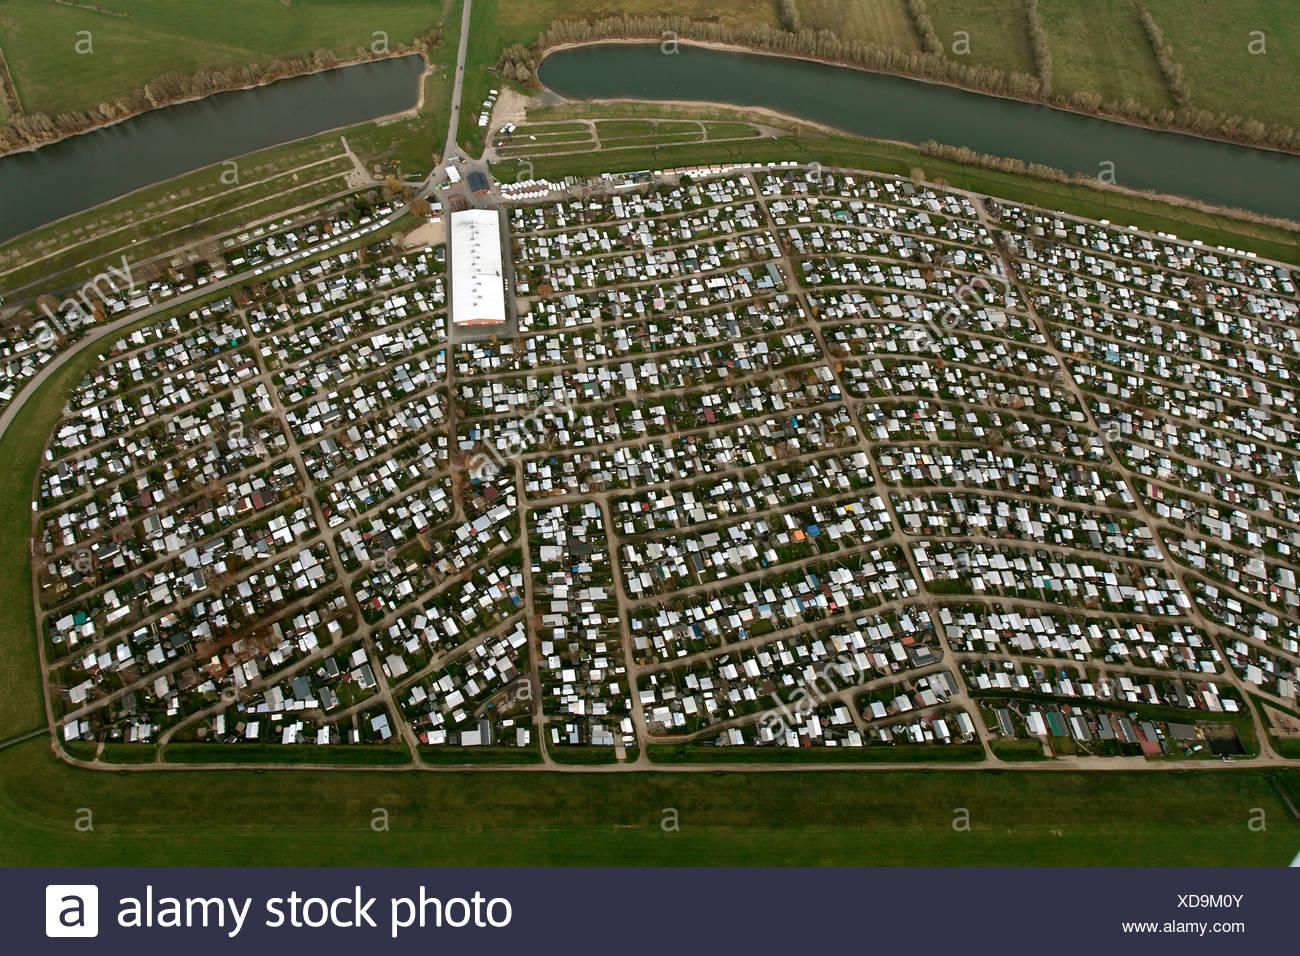 Aerial view, large ground camping, Grav-Insel island, Rhine river, Wesel, Niederrhein region, North Rhine-Westphalia - Stock Image